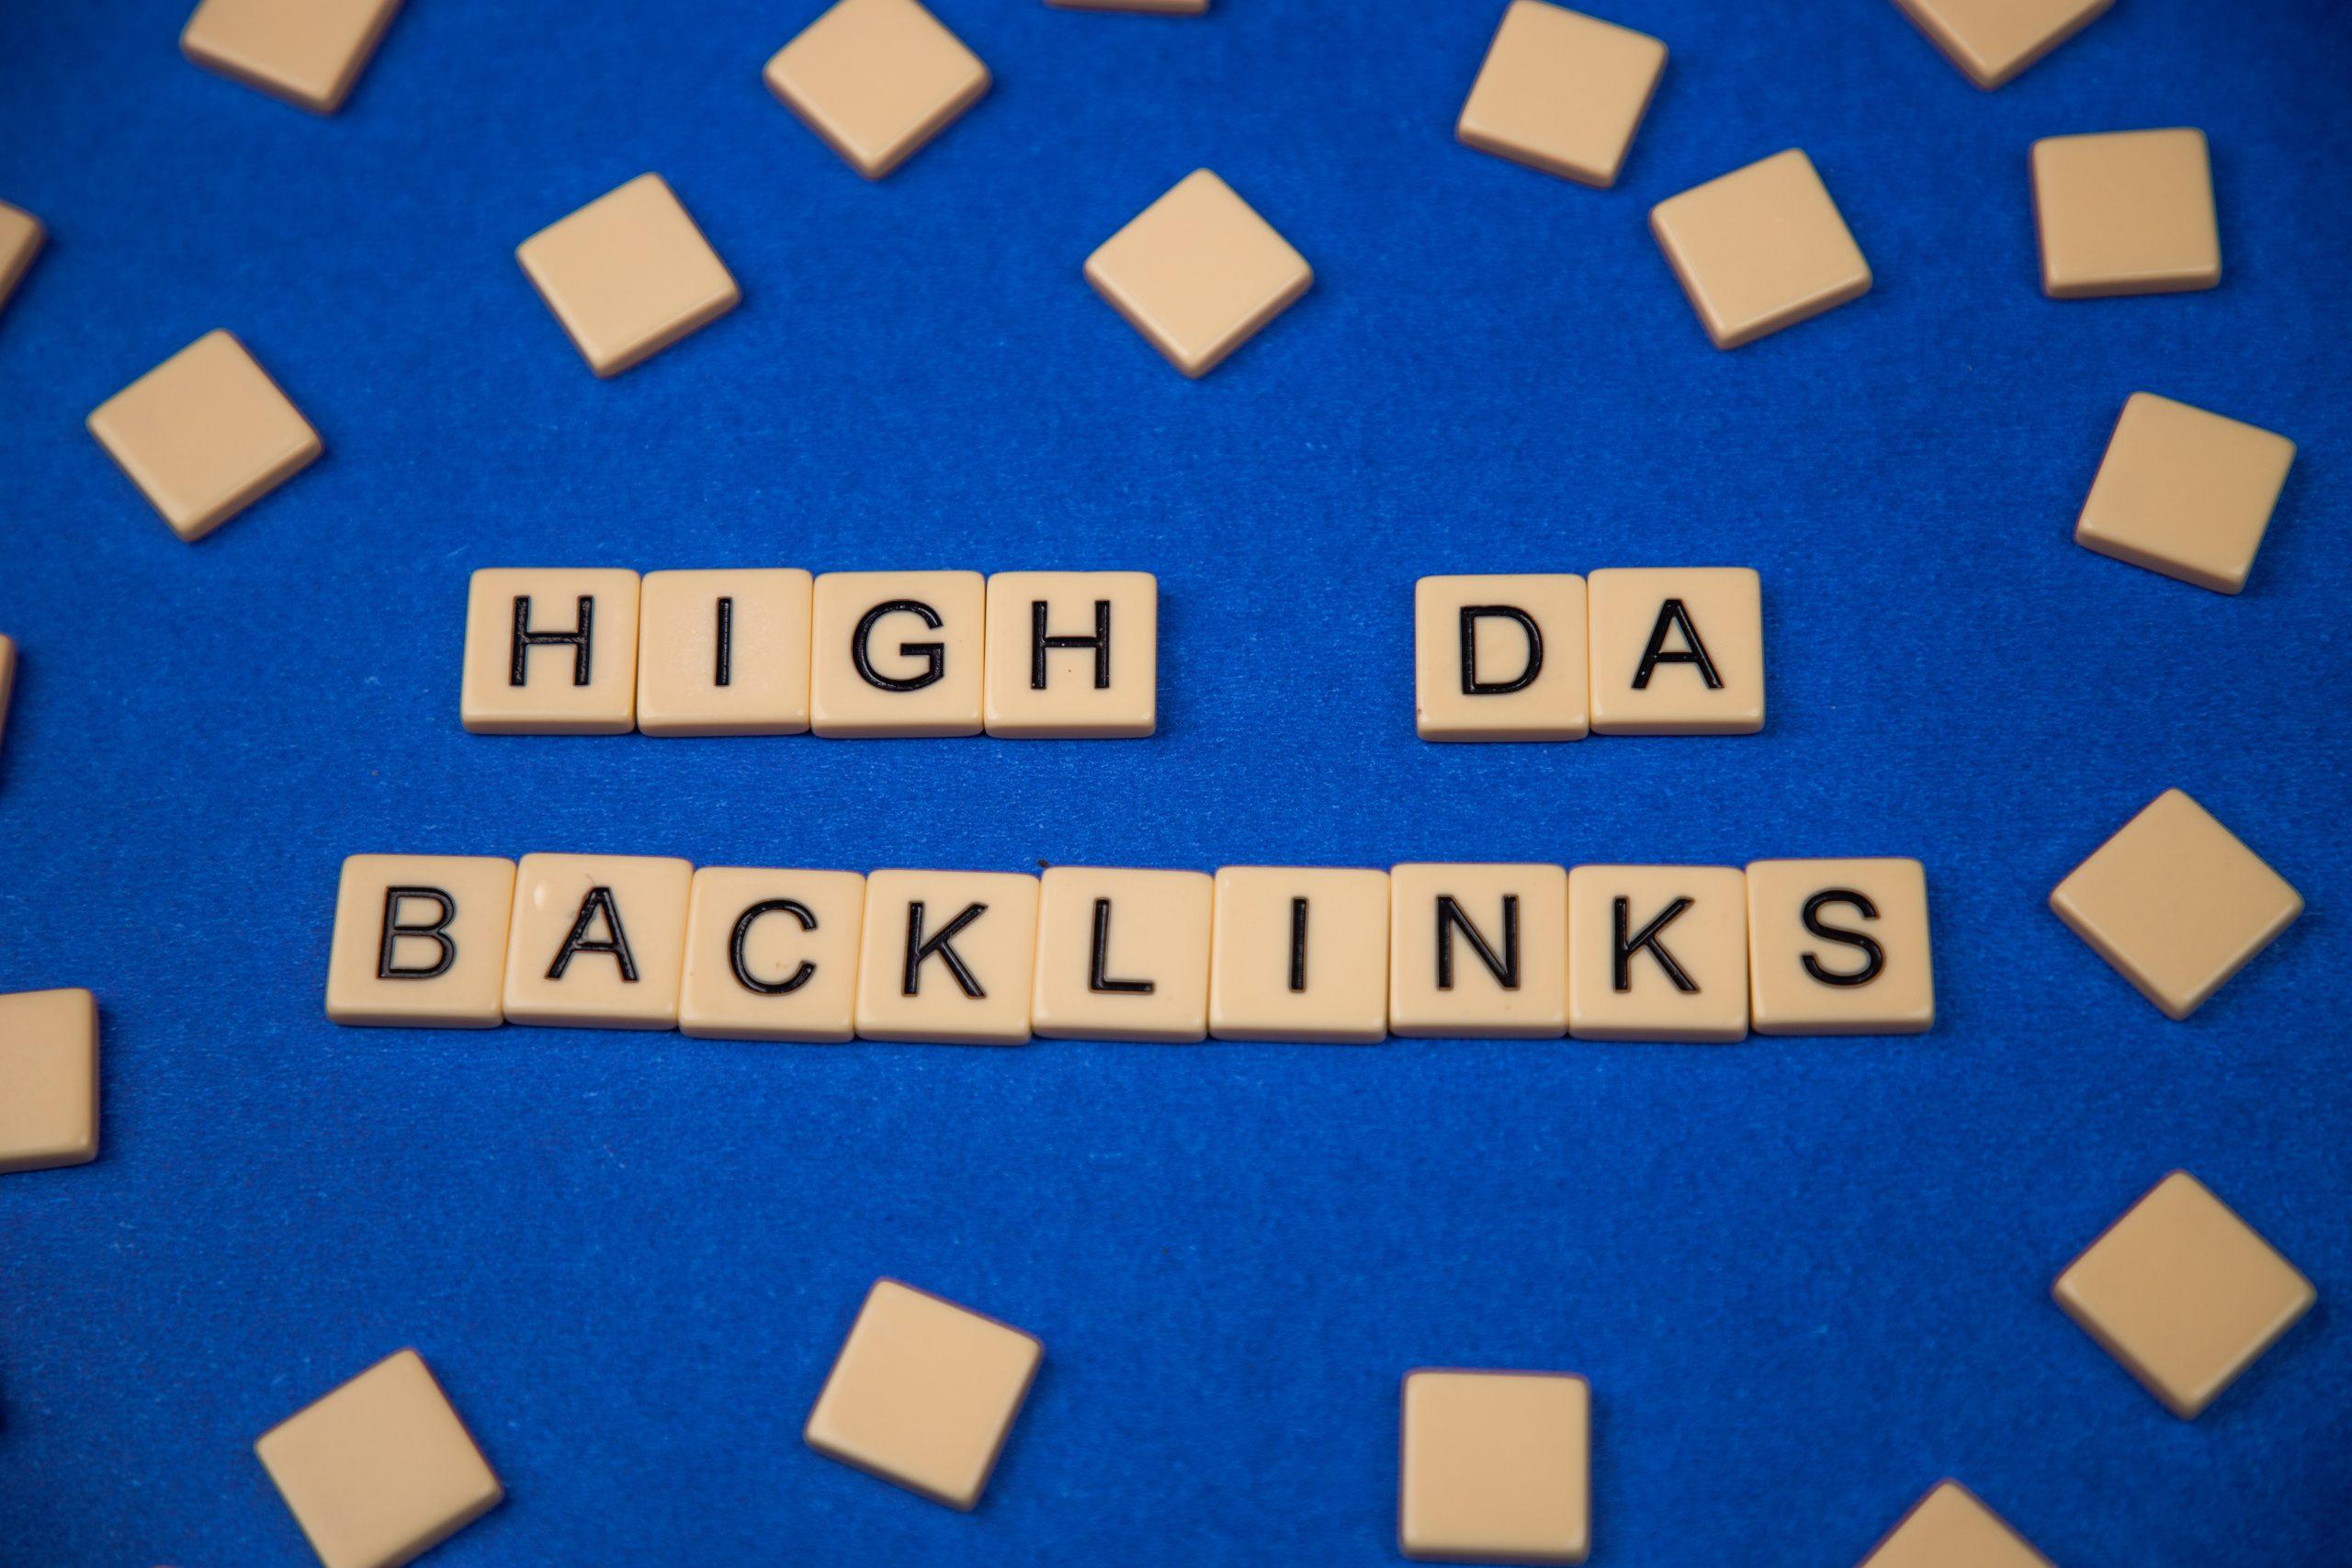 High DA Backlinks written on scrabble